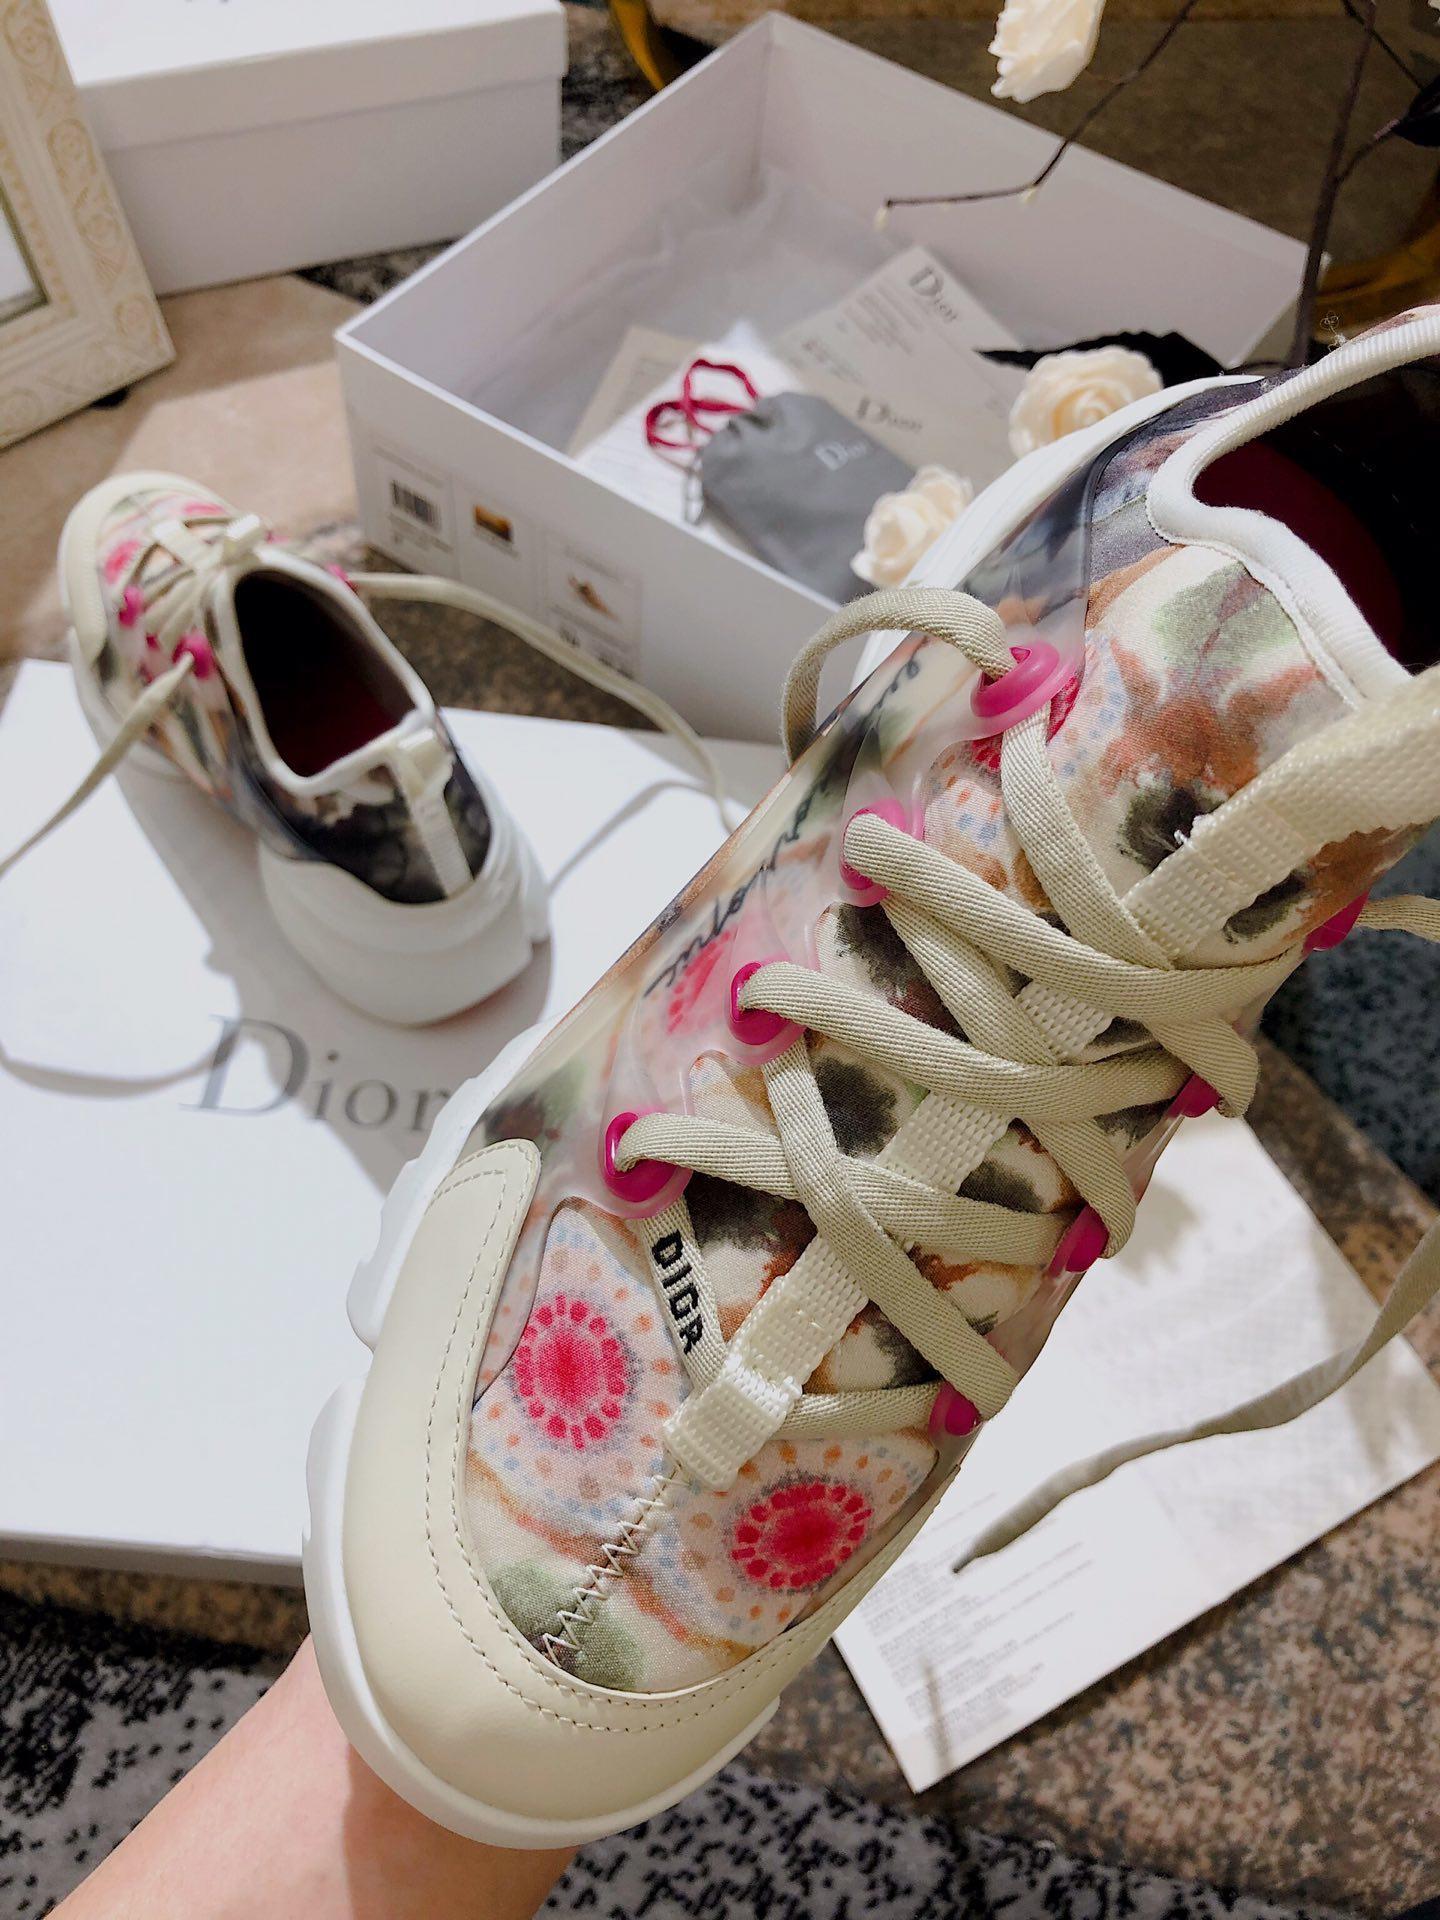 DIOR女士运动鞋 迪奥19ss新款Crusie J'ADIOR运动鞋